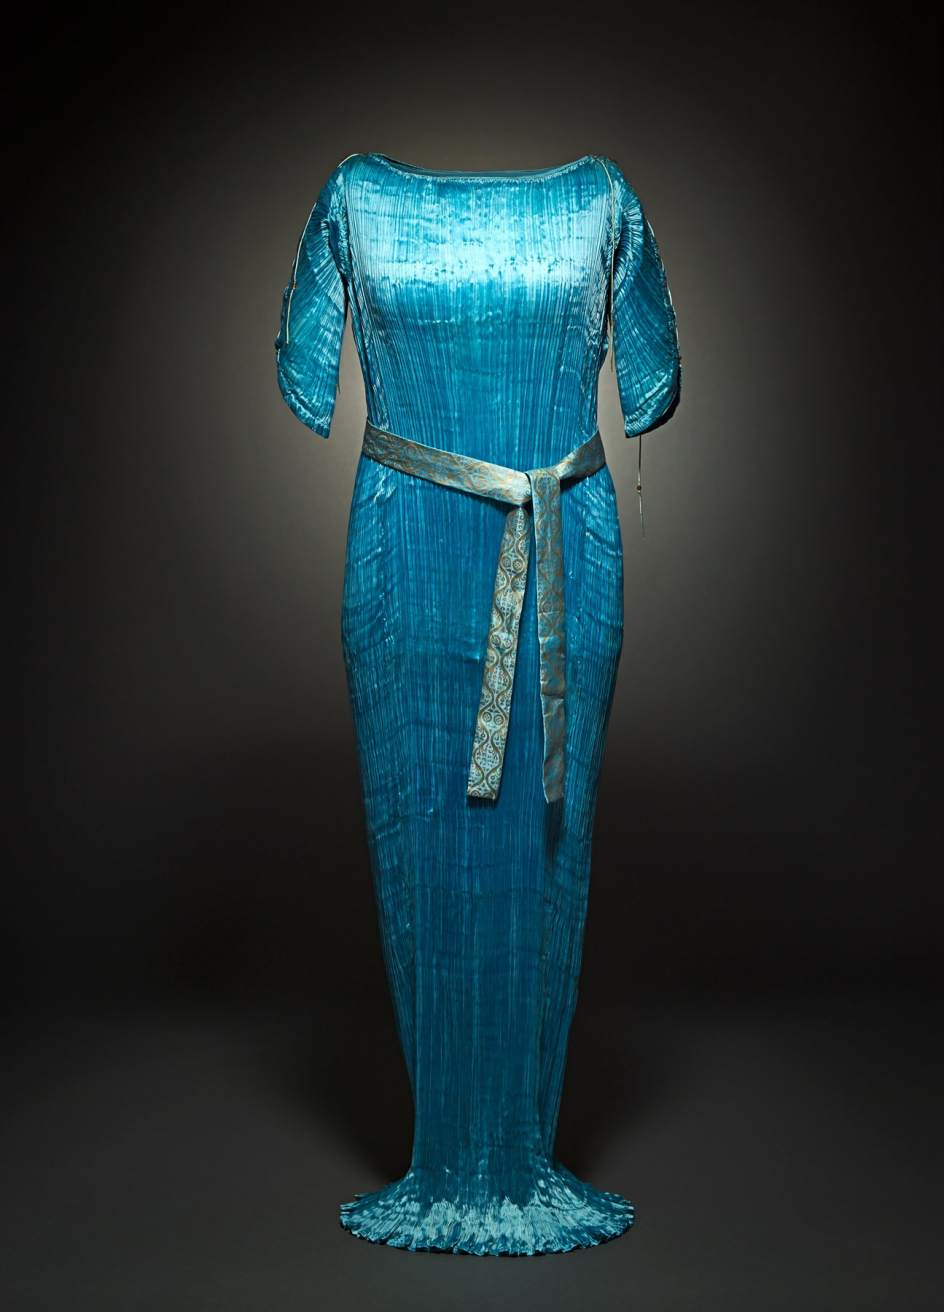 Vestido Delphos. Hacia 1920. Tafetán de seda y cristal de Murano. Centre de Documentació i Museu Tèxtil. Terrassa.